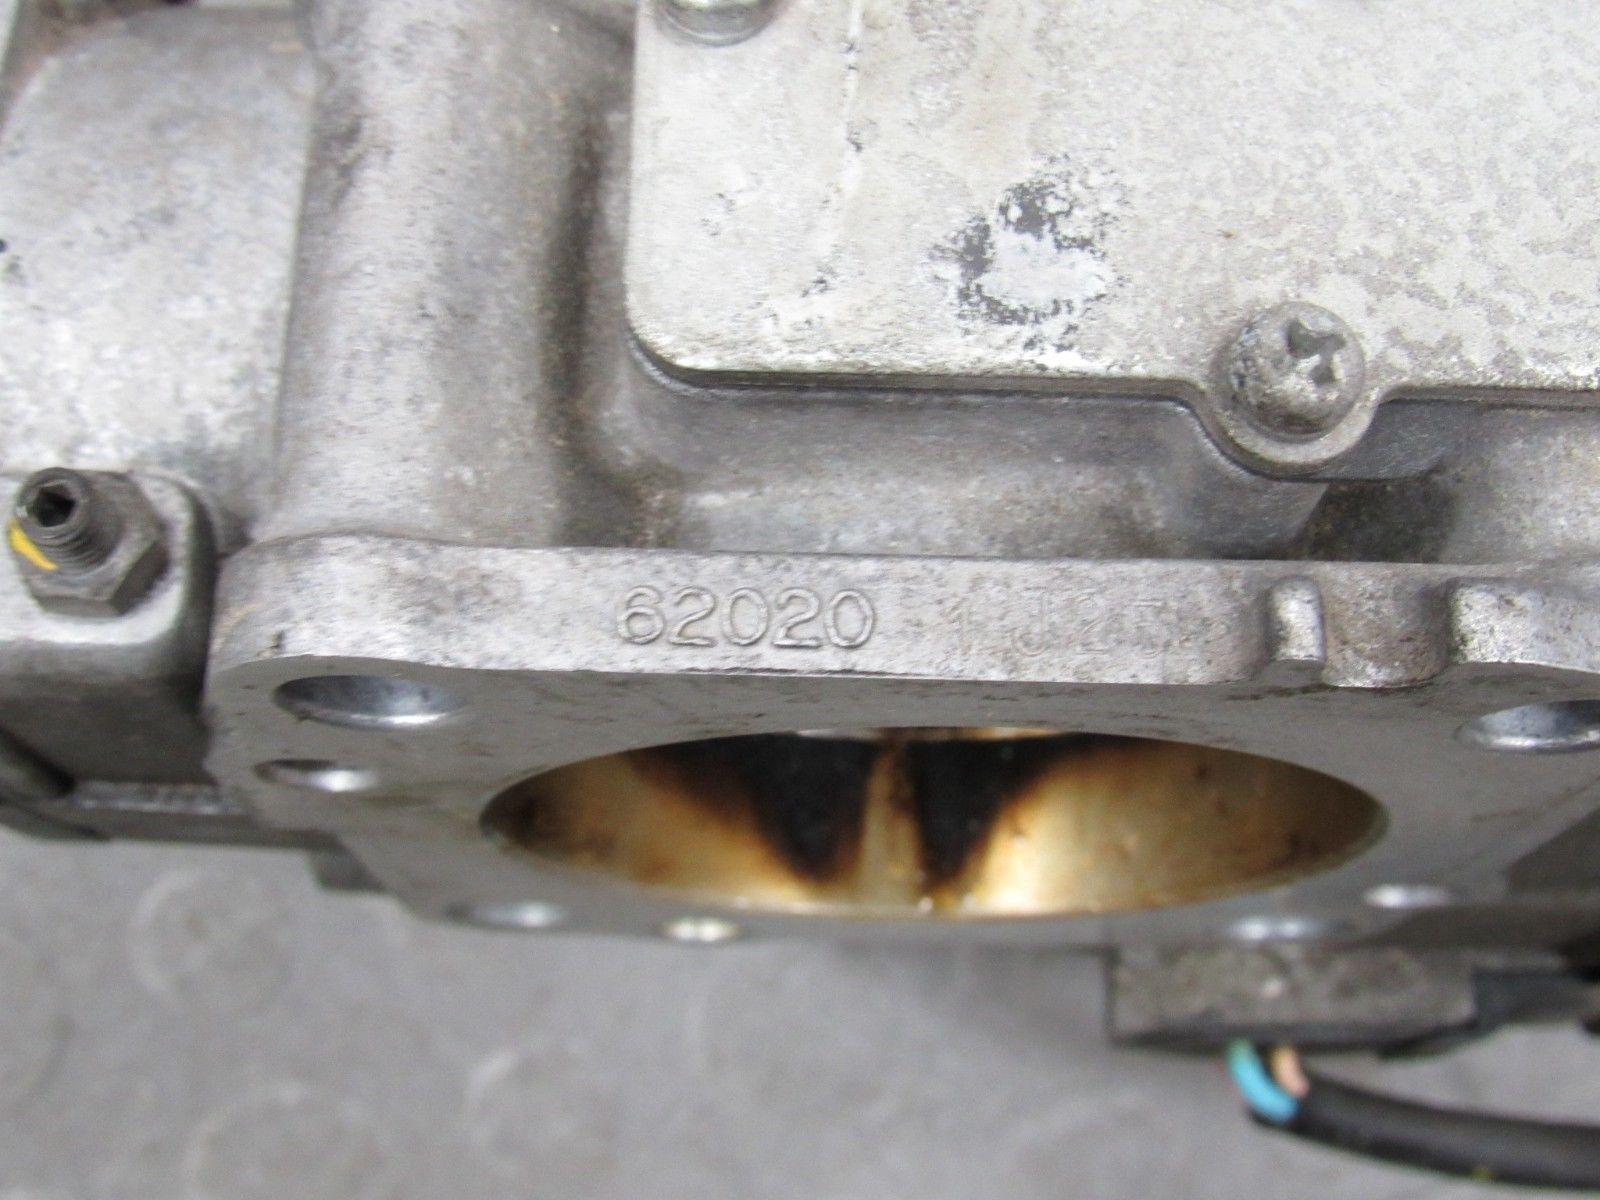 01 02 Toyota 4runner 02 04 Tacoma Tundra 3 4l V6 5vz